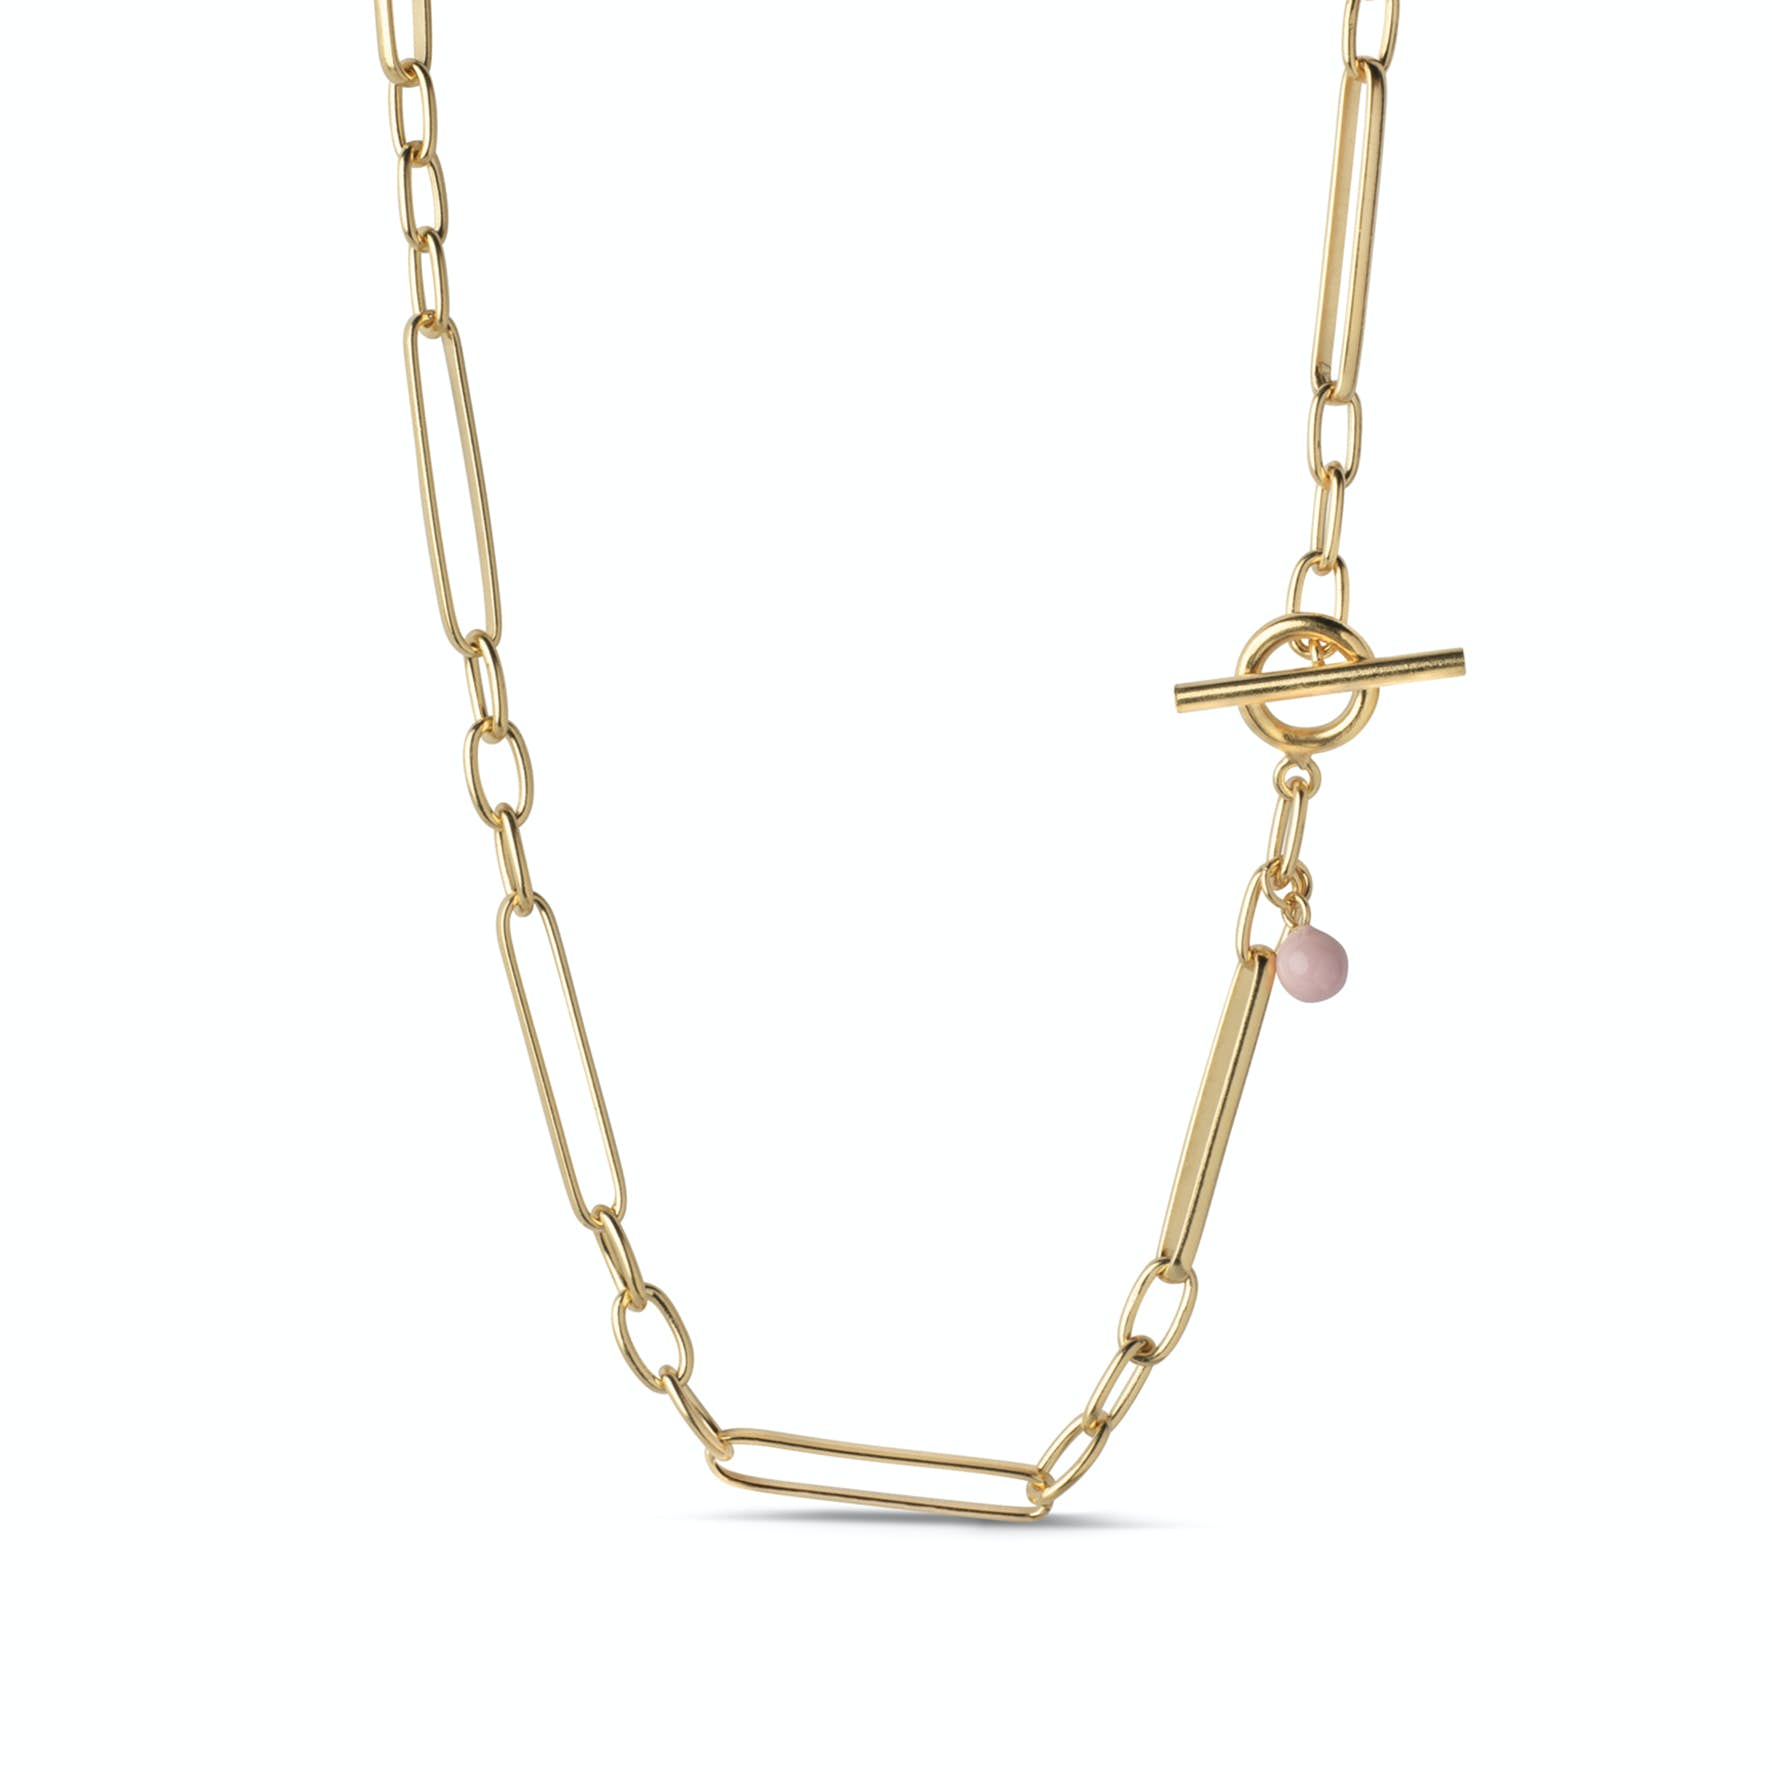 Vilde Necklace von Enamel Copenhagen in Vergoldet-Silber Sterling 925